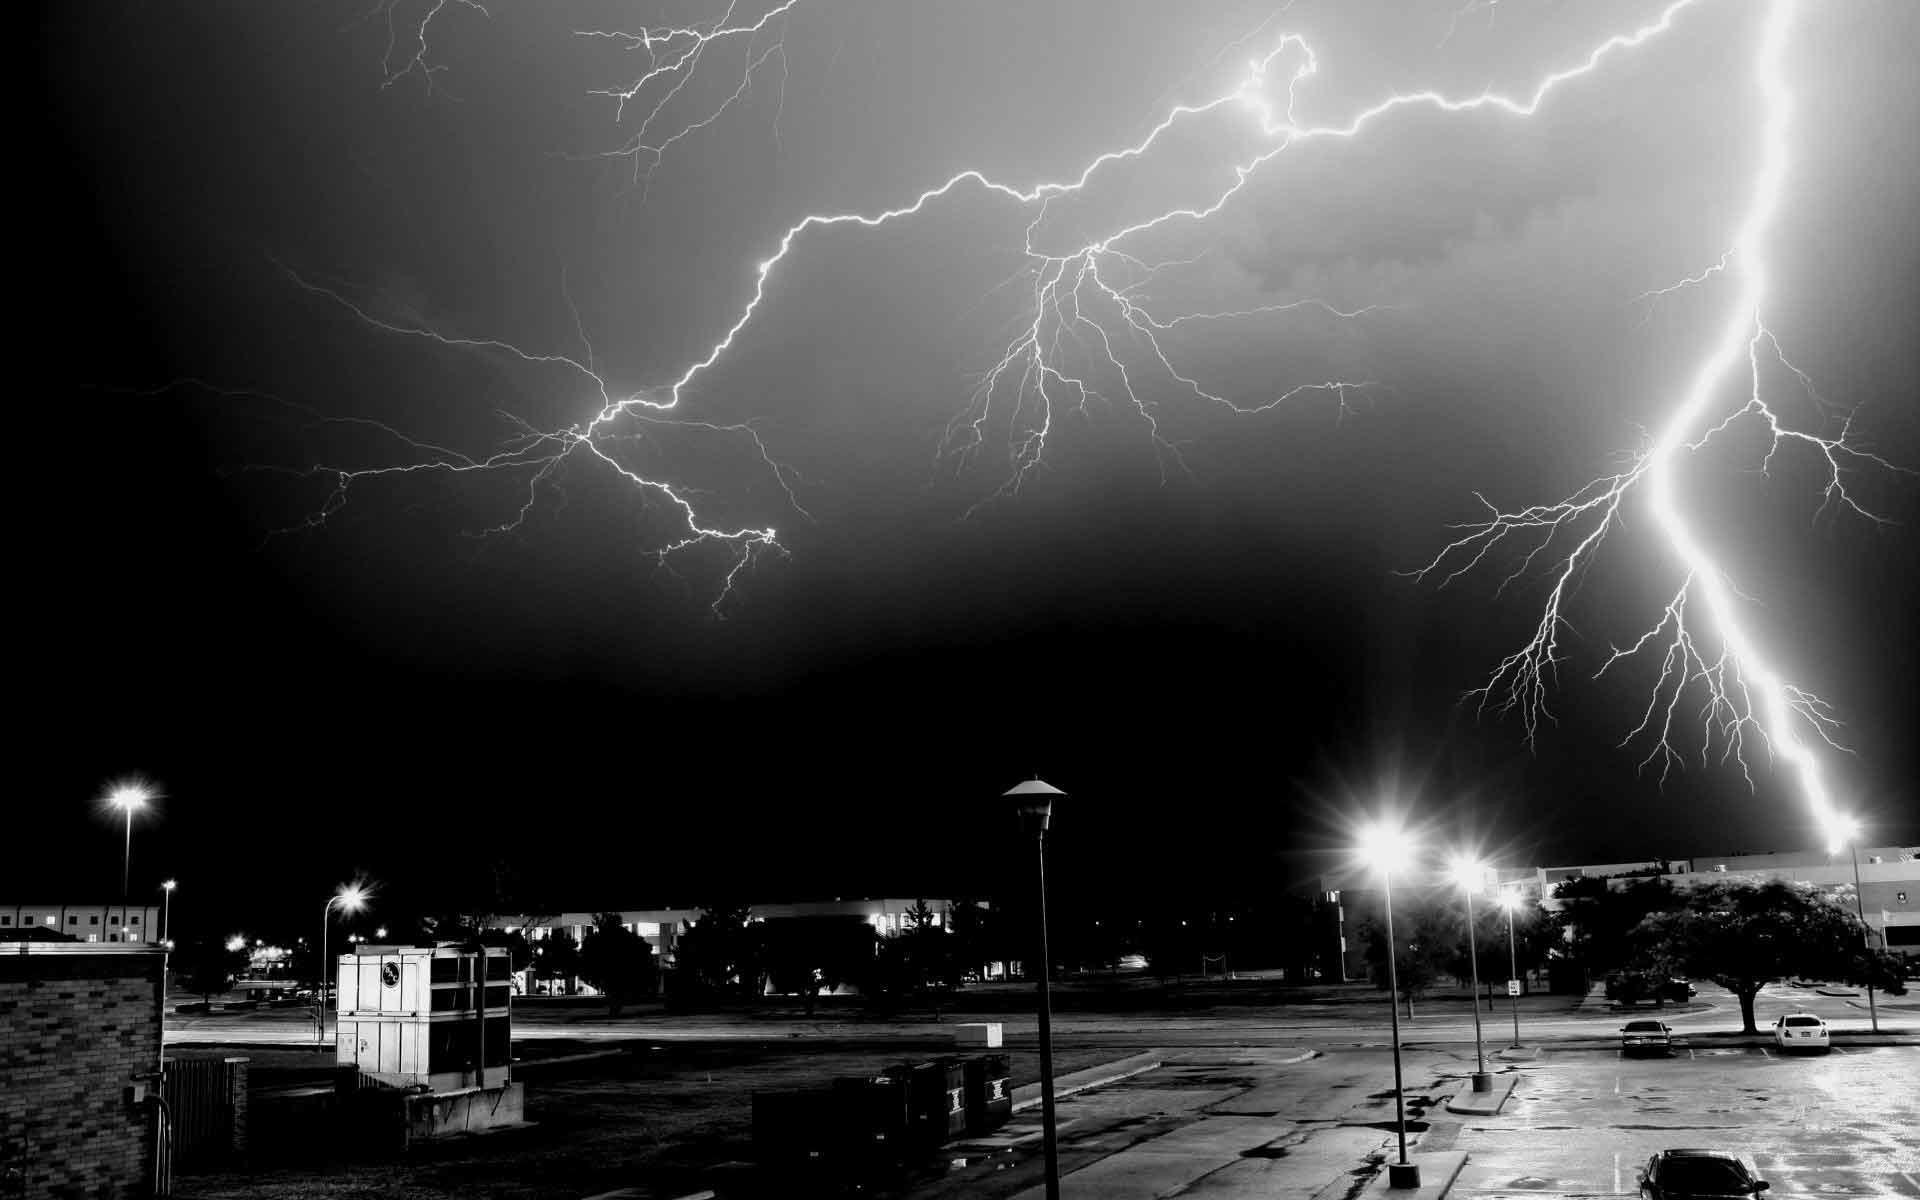 Thunderstorm desktop wallpaper 61 images - Lightning wallpaper 4k ...